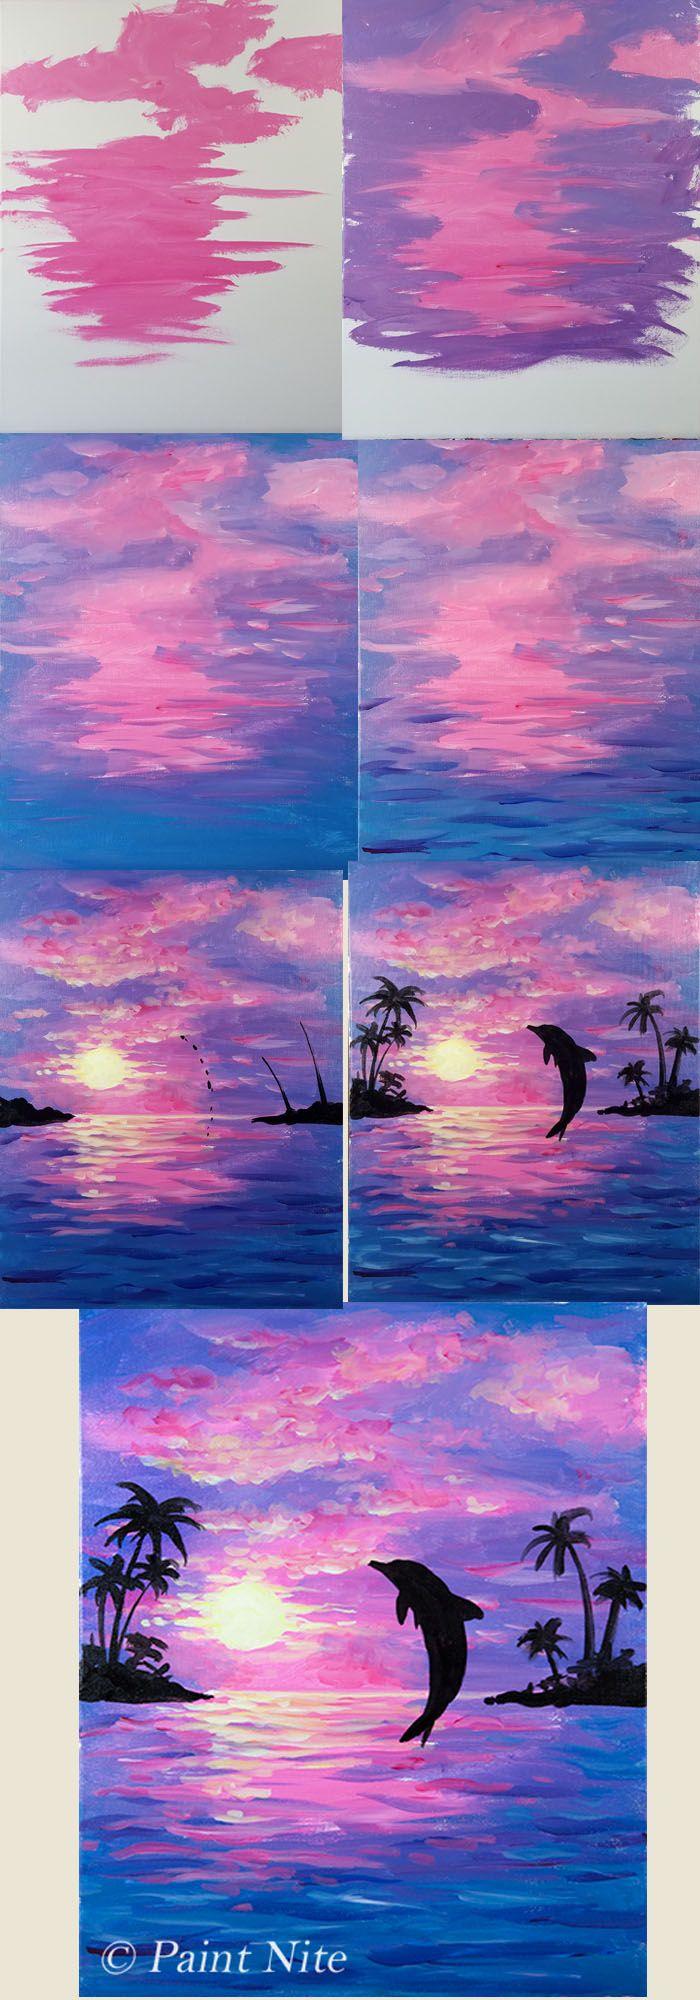 Dolphin Joy Watercolor Paintings Tutorials Watercolor Paintings